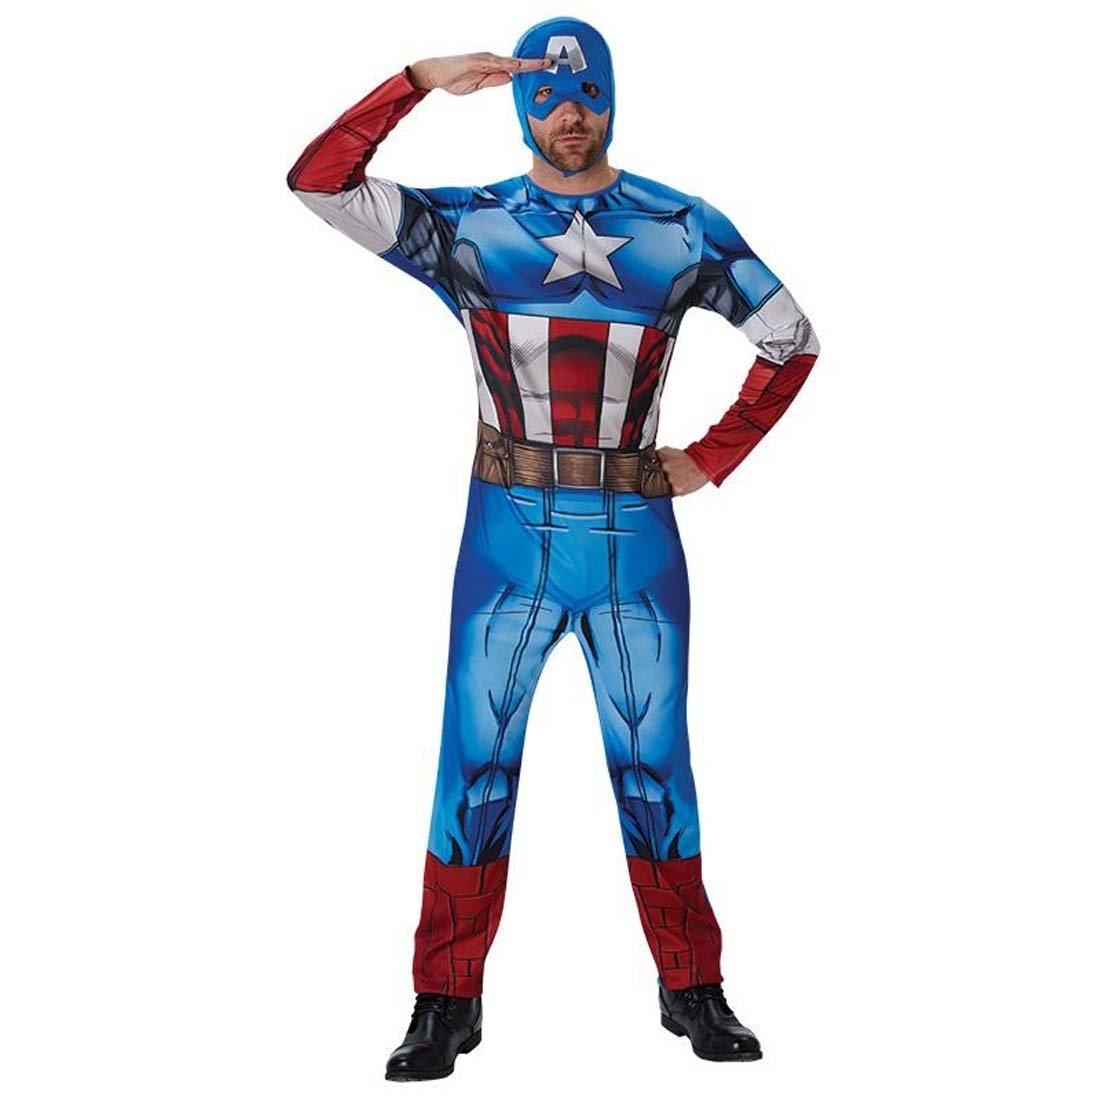 NET TOYS Disfraz Capitán América Traje Hombre superhéroe Atuendo cómic héroe Ropa Vengadores Marvel Vestimenta héroe américa Disfraz heroico varón